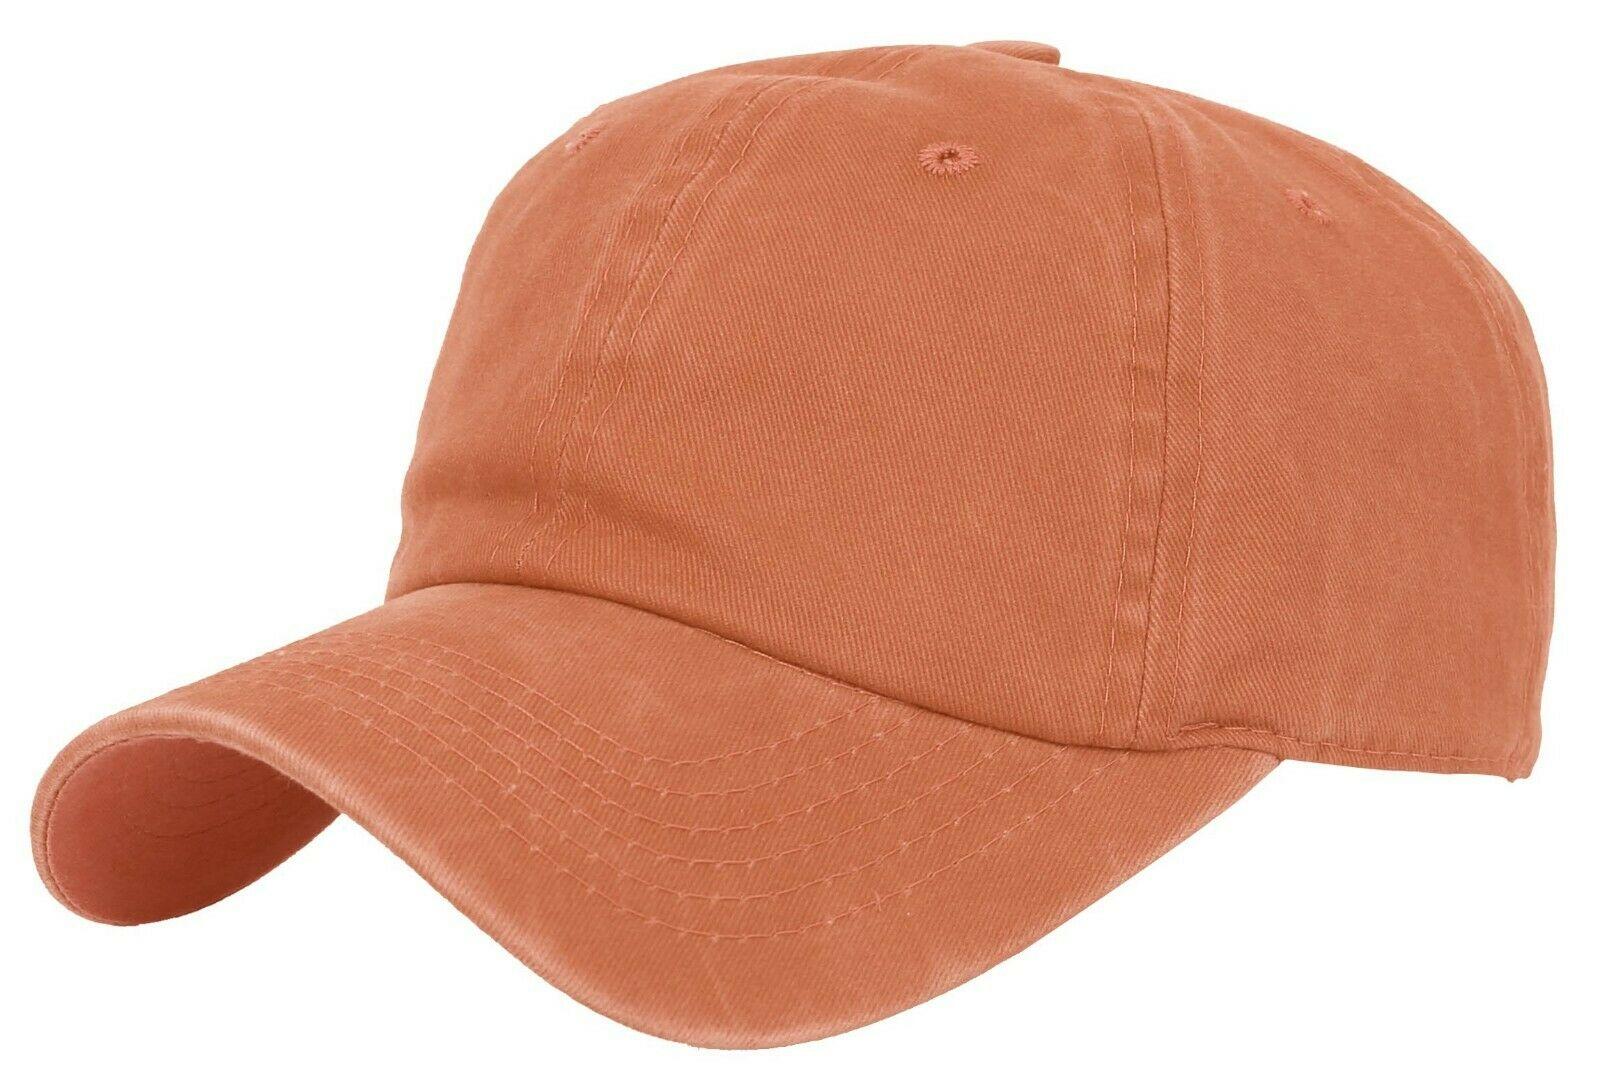 BASEBALL-CAP-Plain-Dad-Hat-Low-Profile-Vintage-Washed-Pigment-Adjustable thumbnail 12